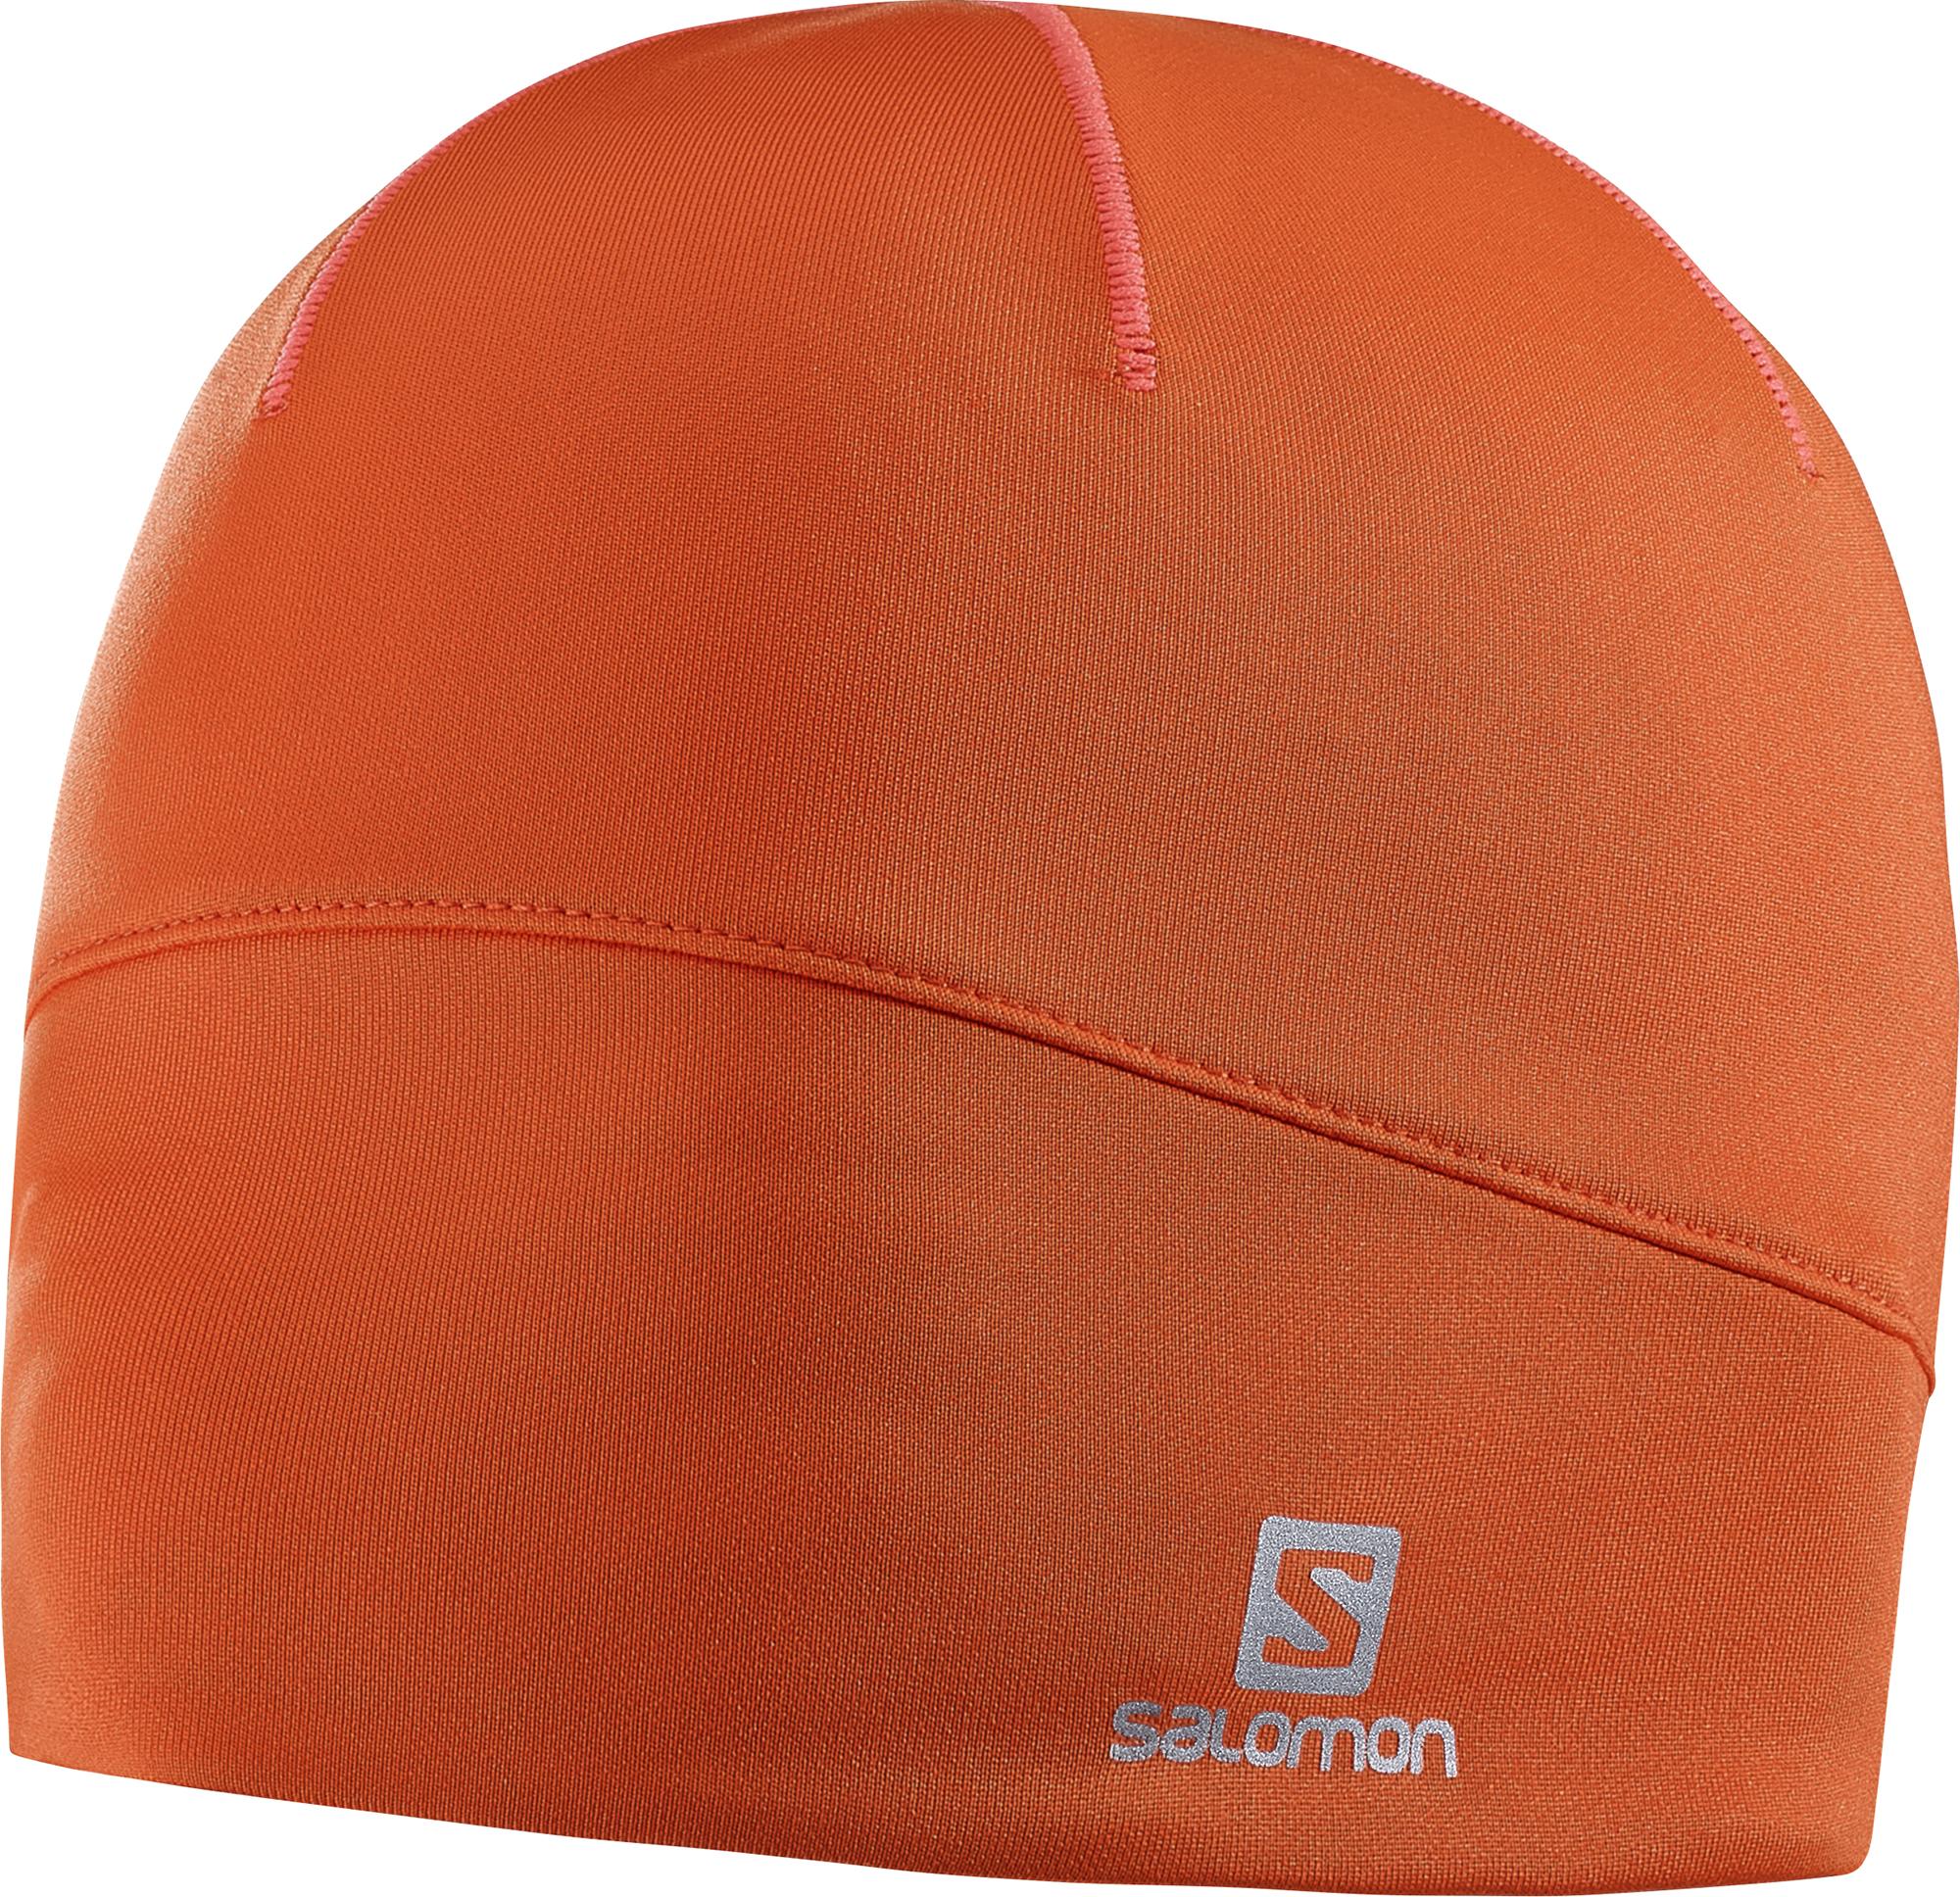 Salomon Active Beanie 390227 oranžová